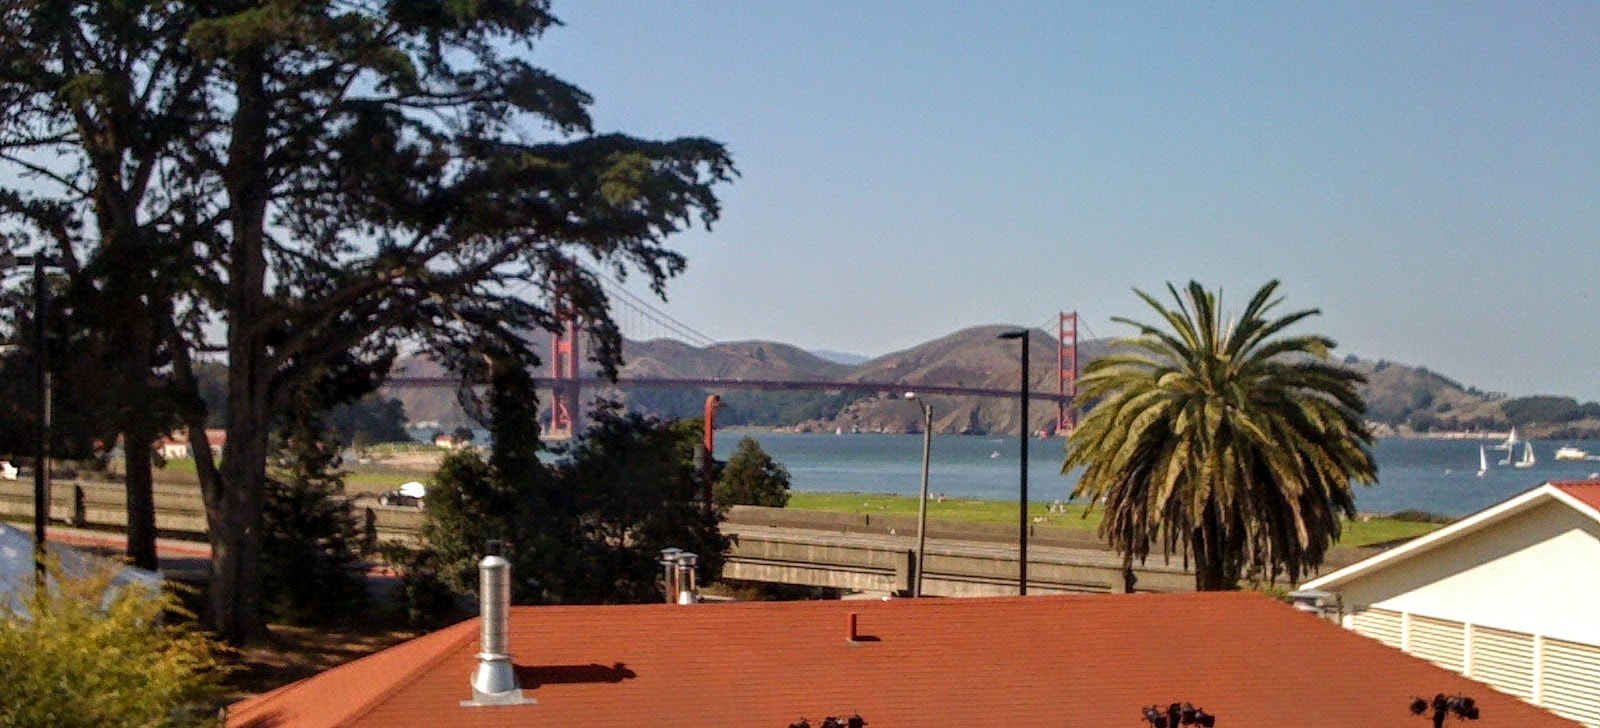 View from The Walt Disney Family Museum, Presidio, SF